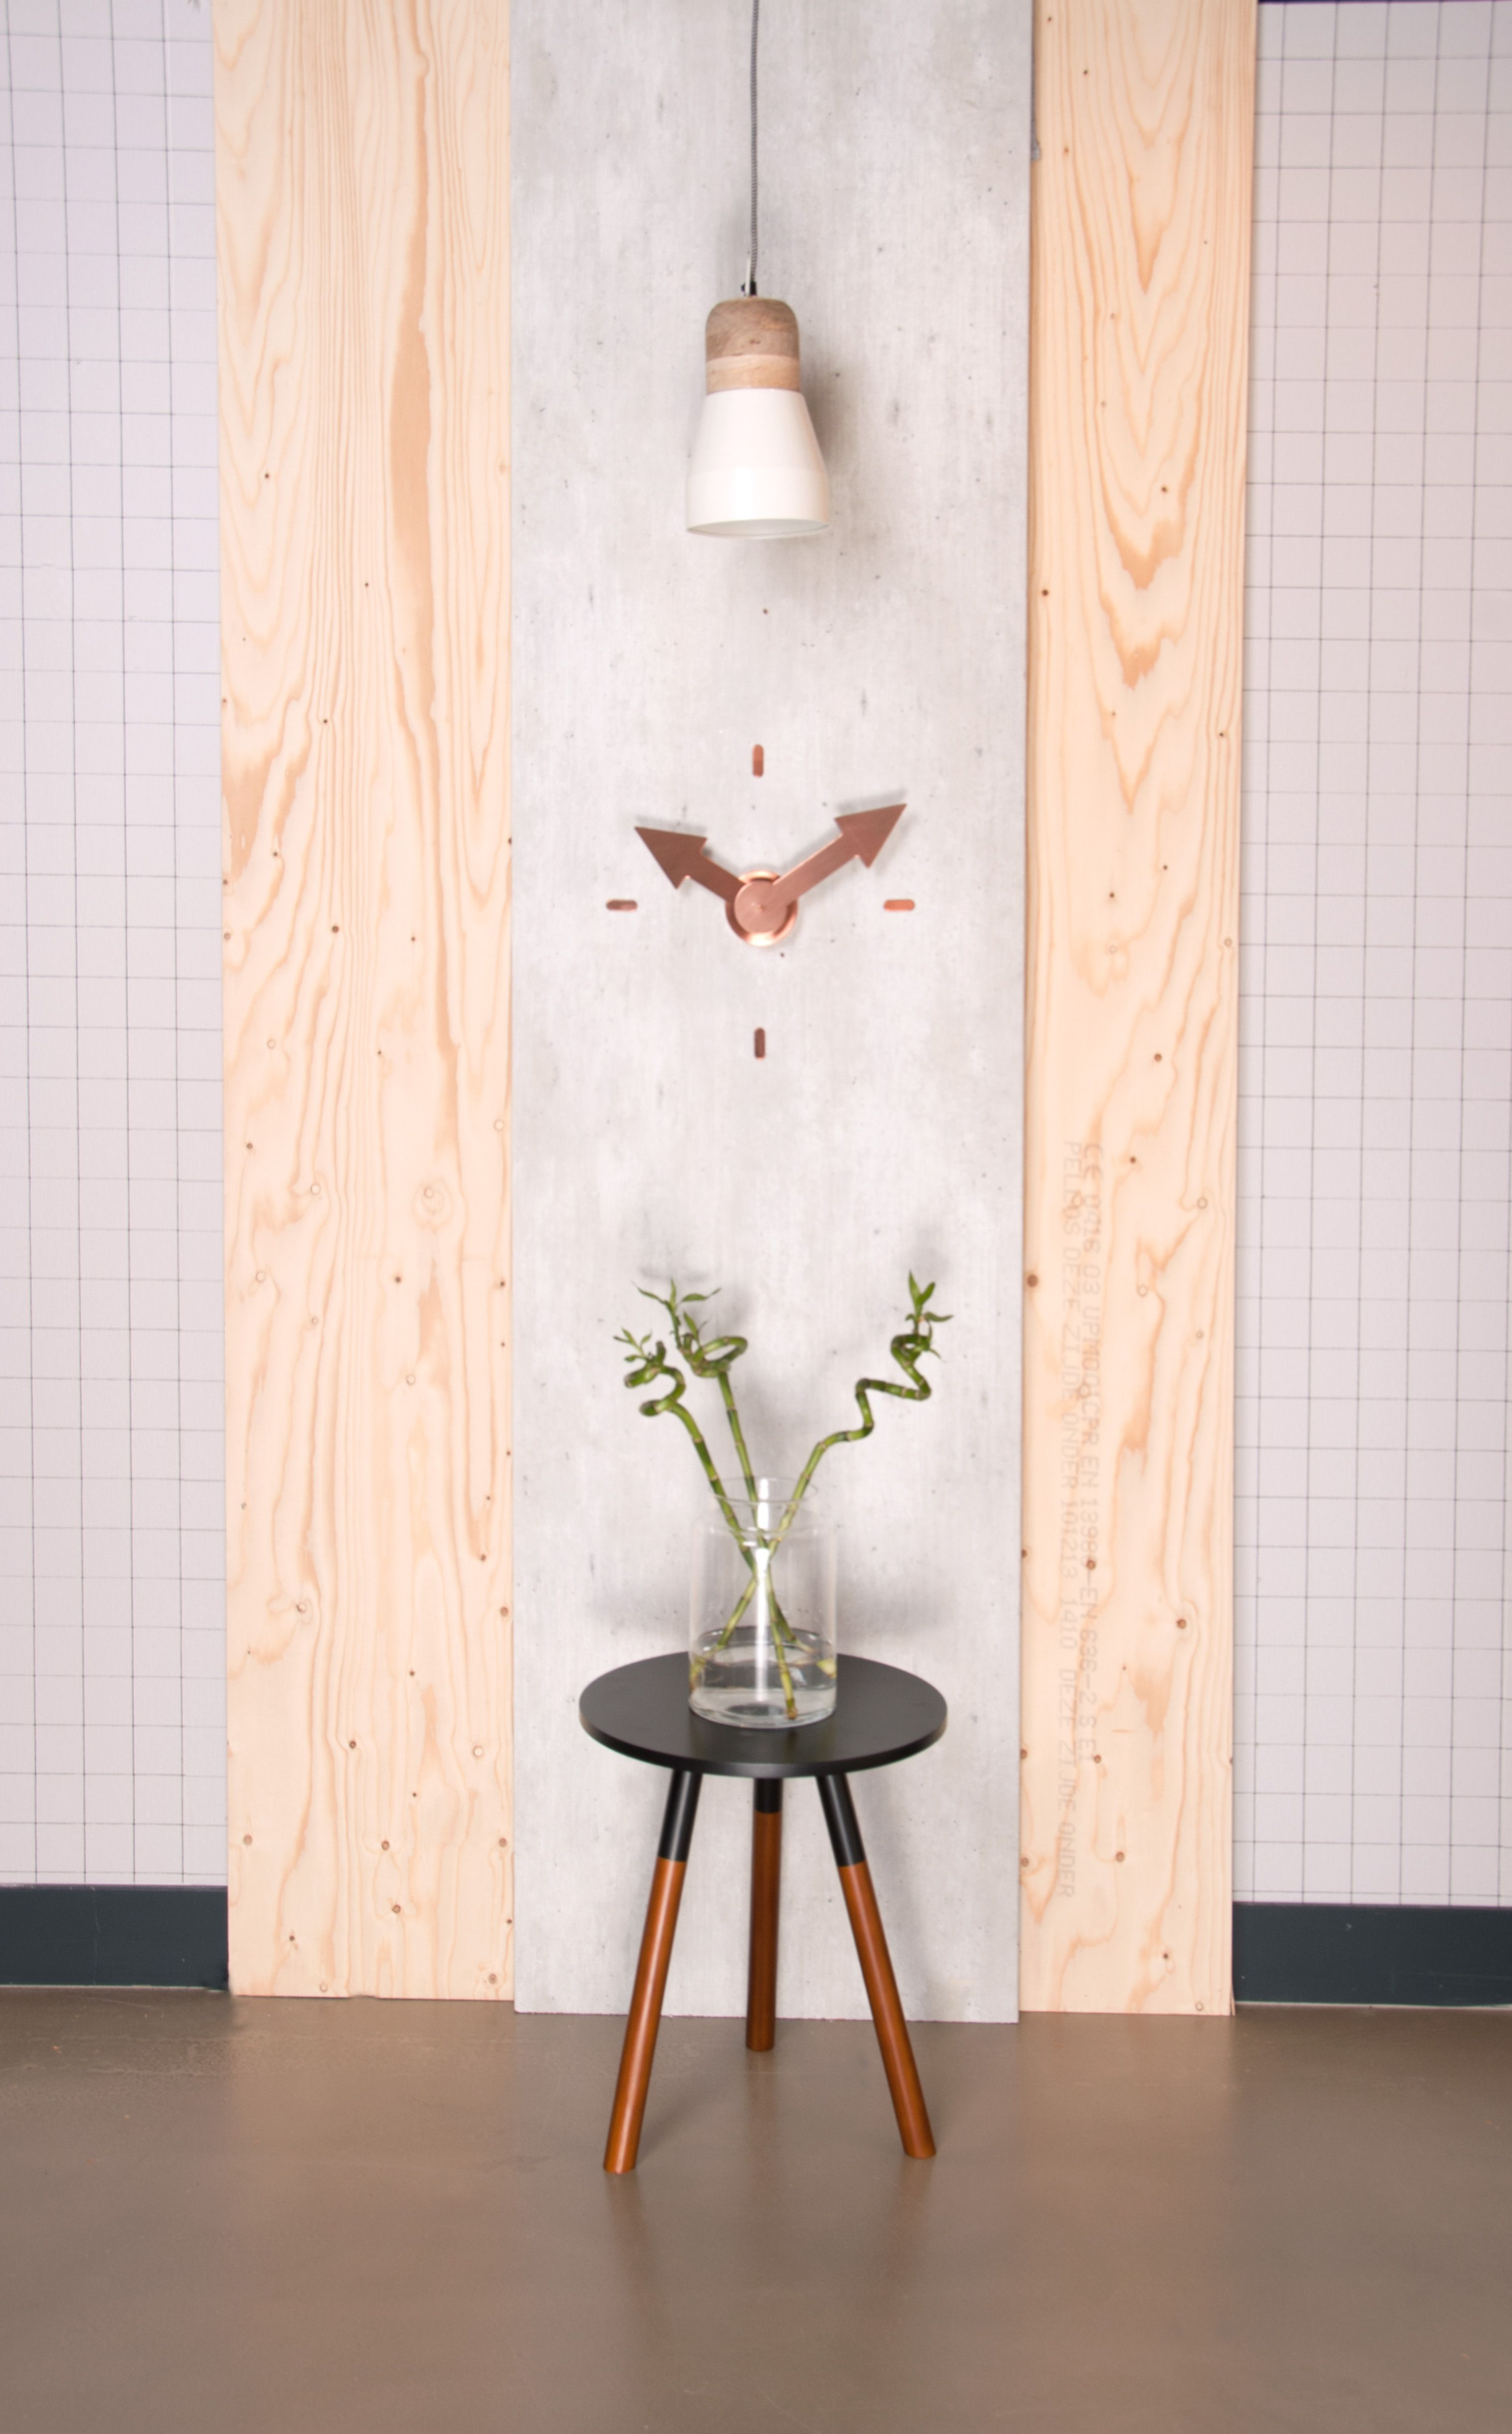 Present time woonaccessoires woondecoratie klok modern woonkamer interieur